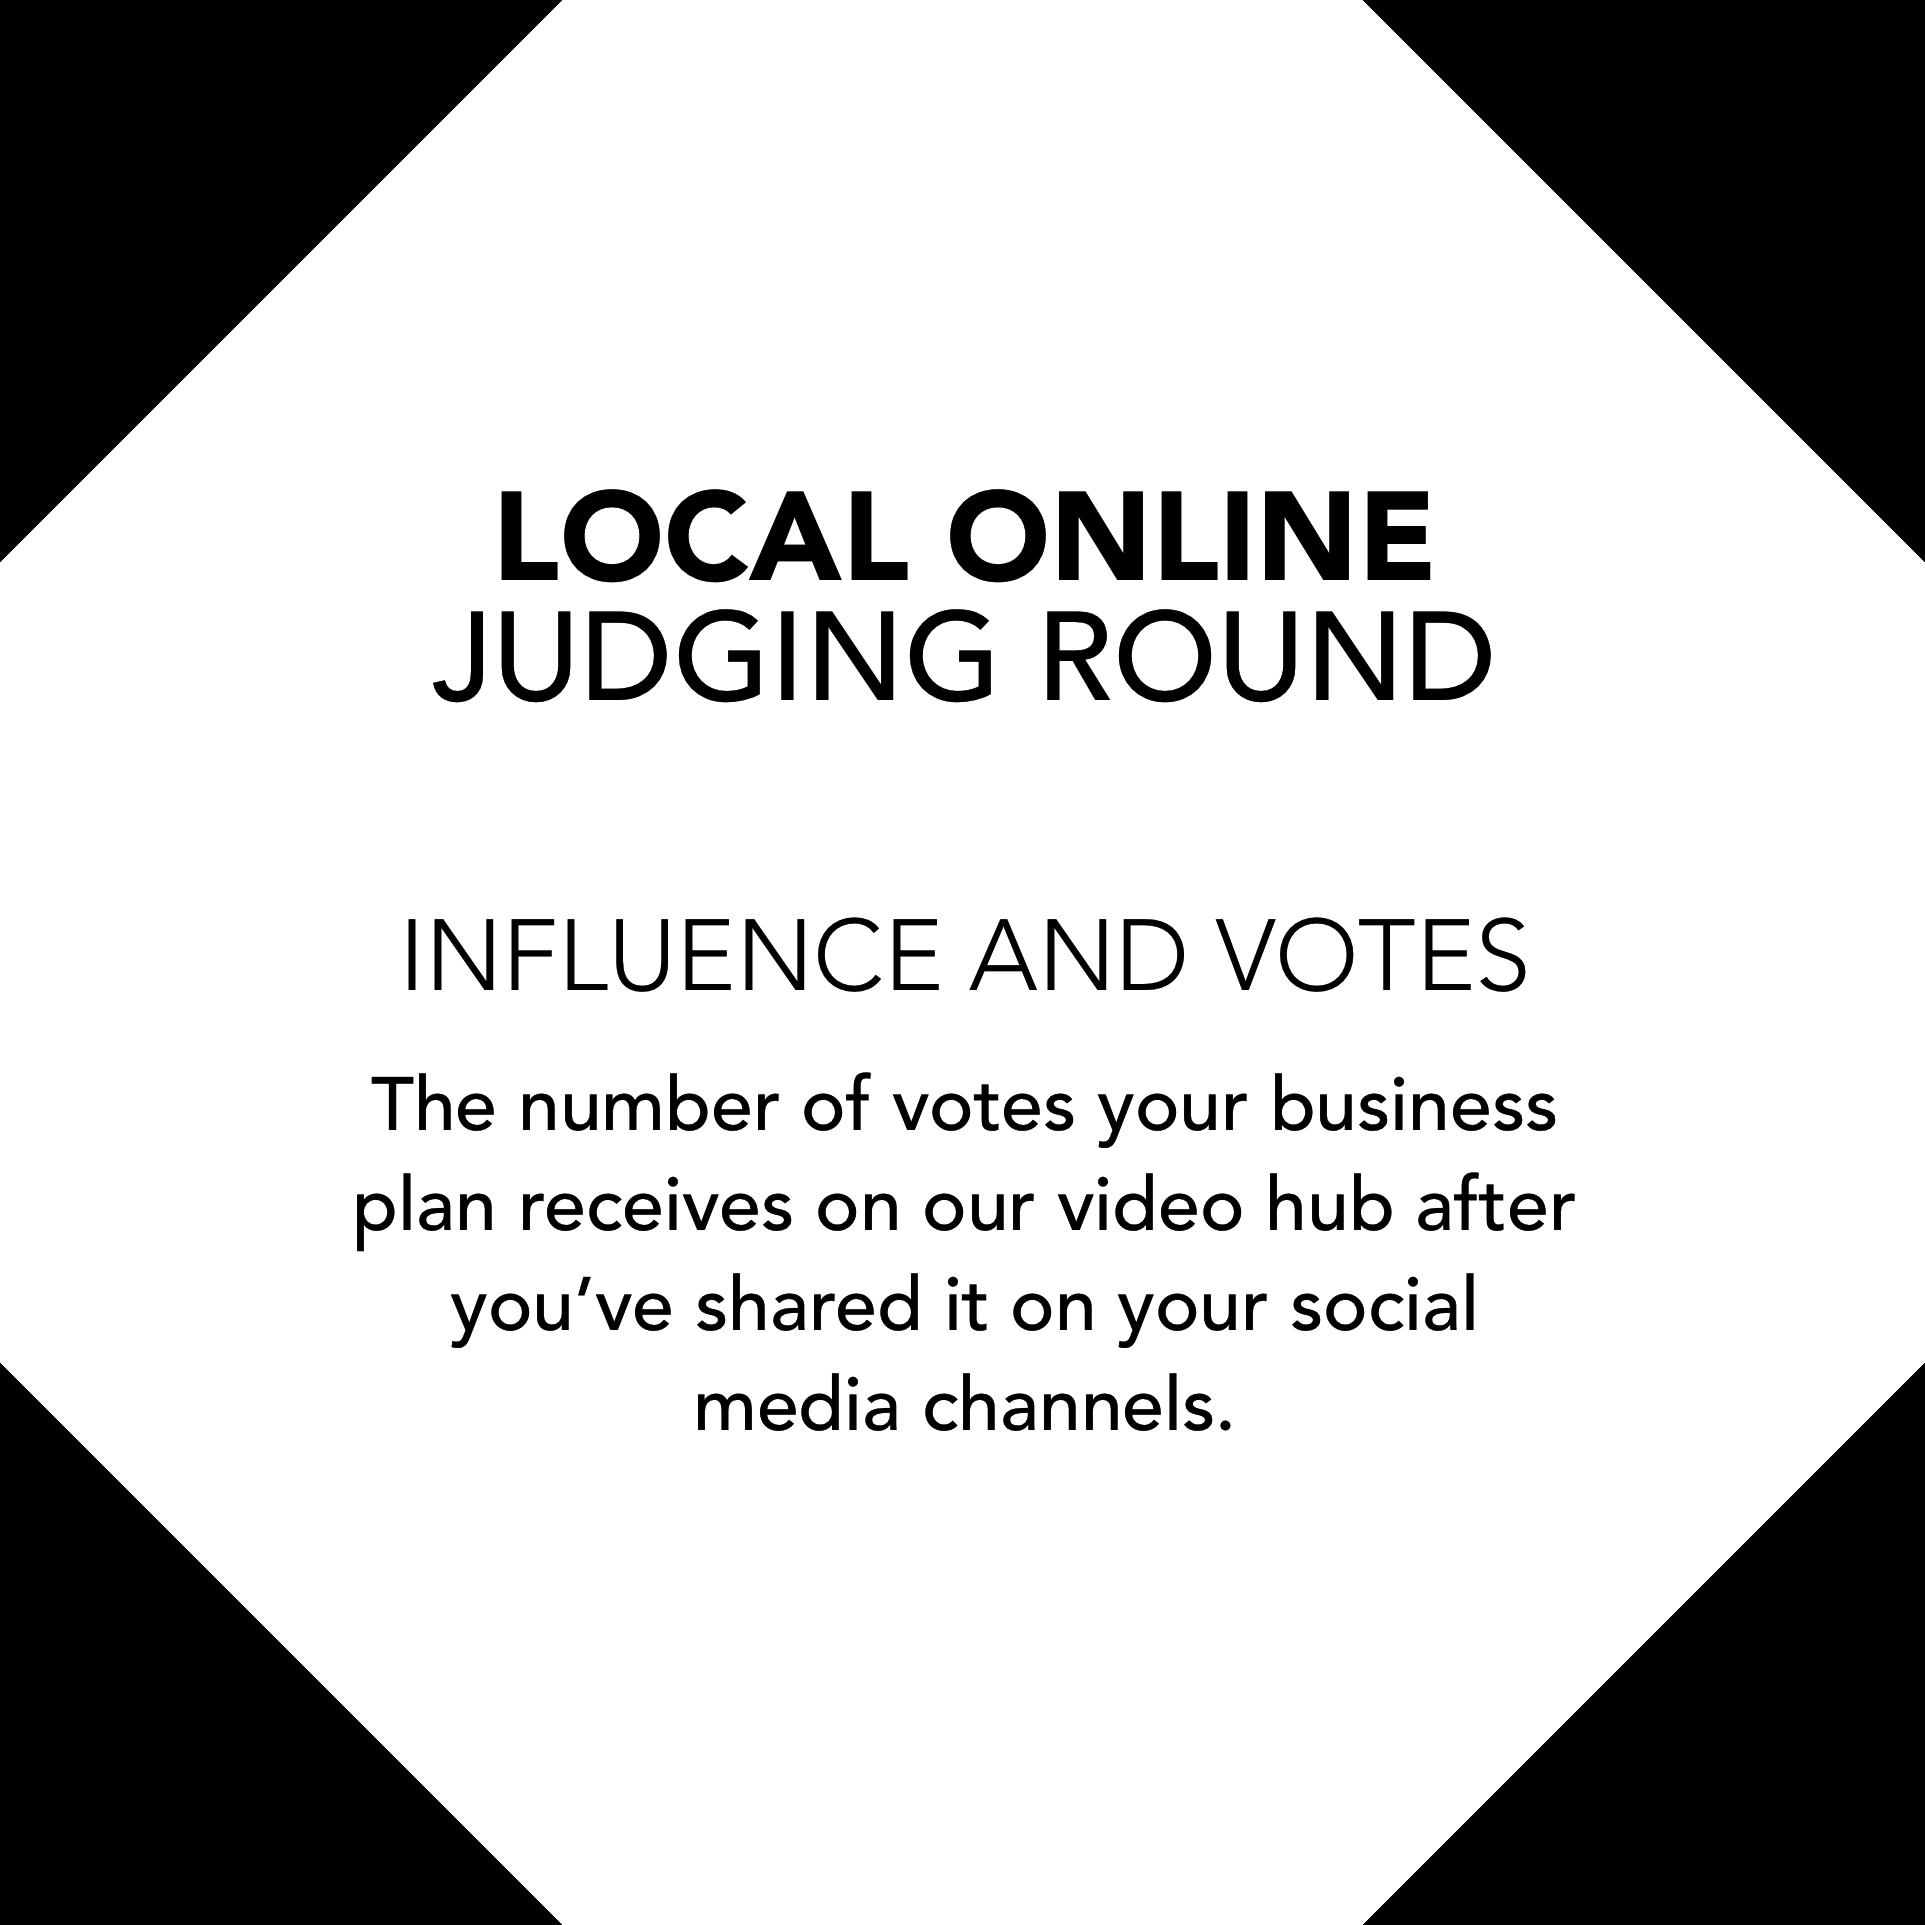 local online judging information